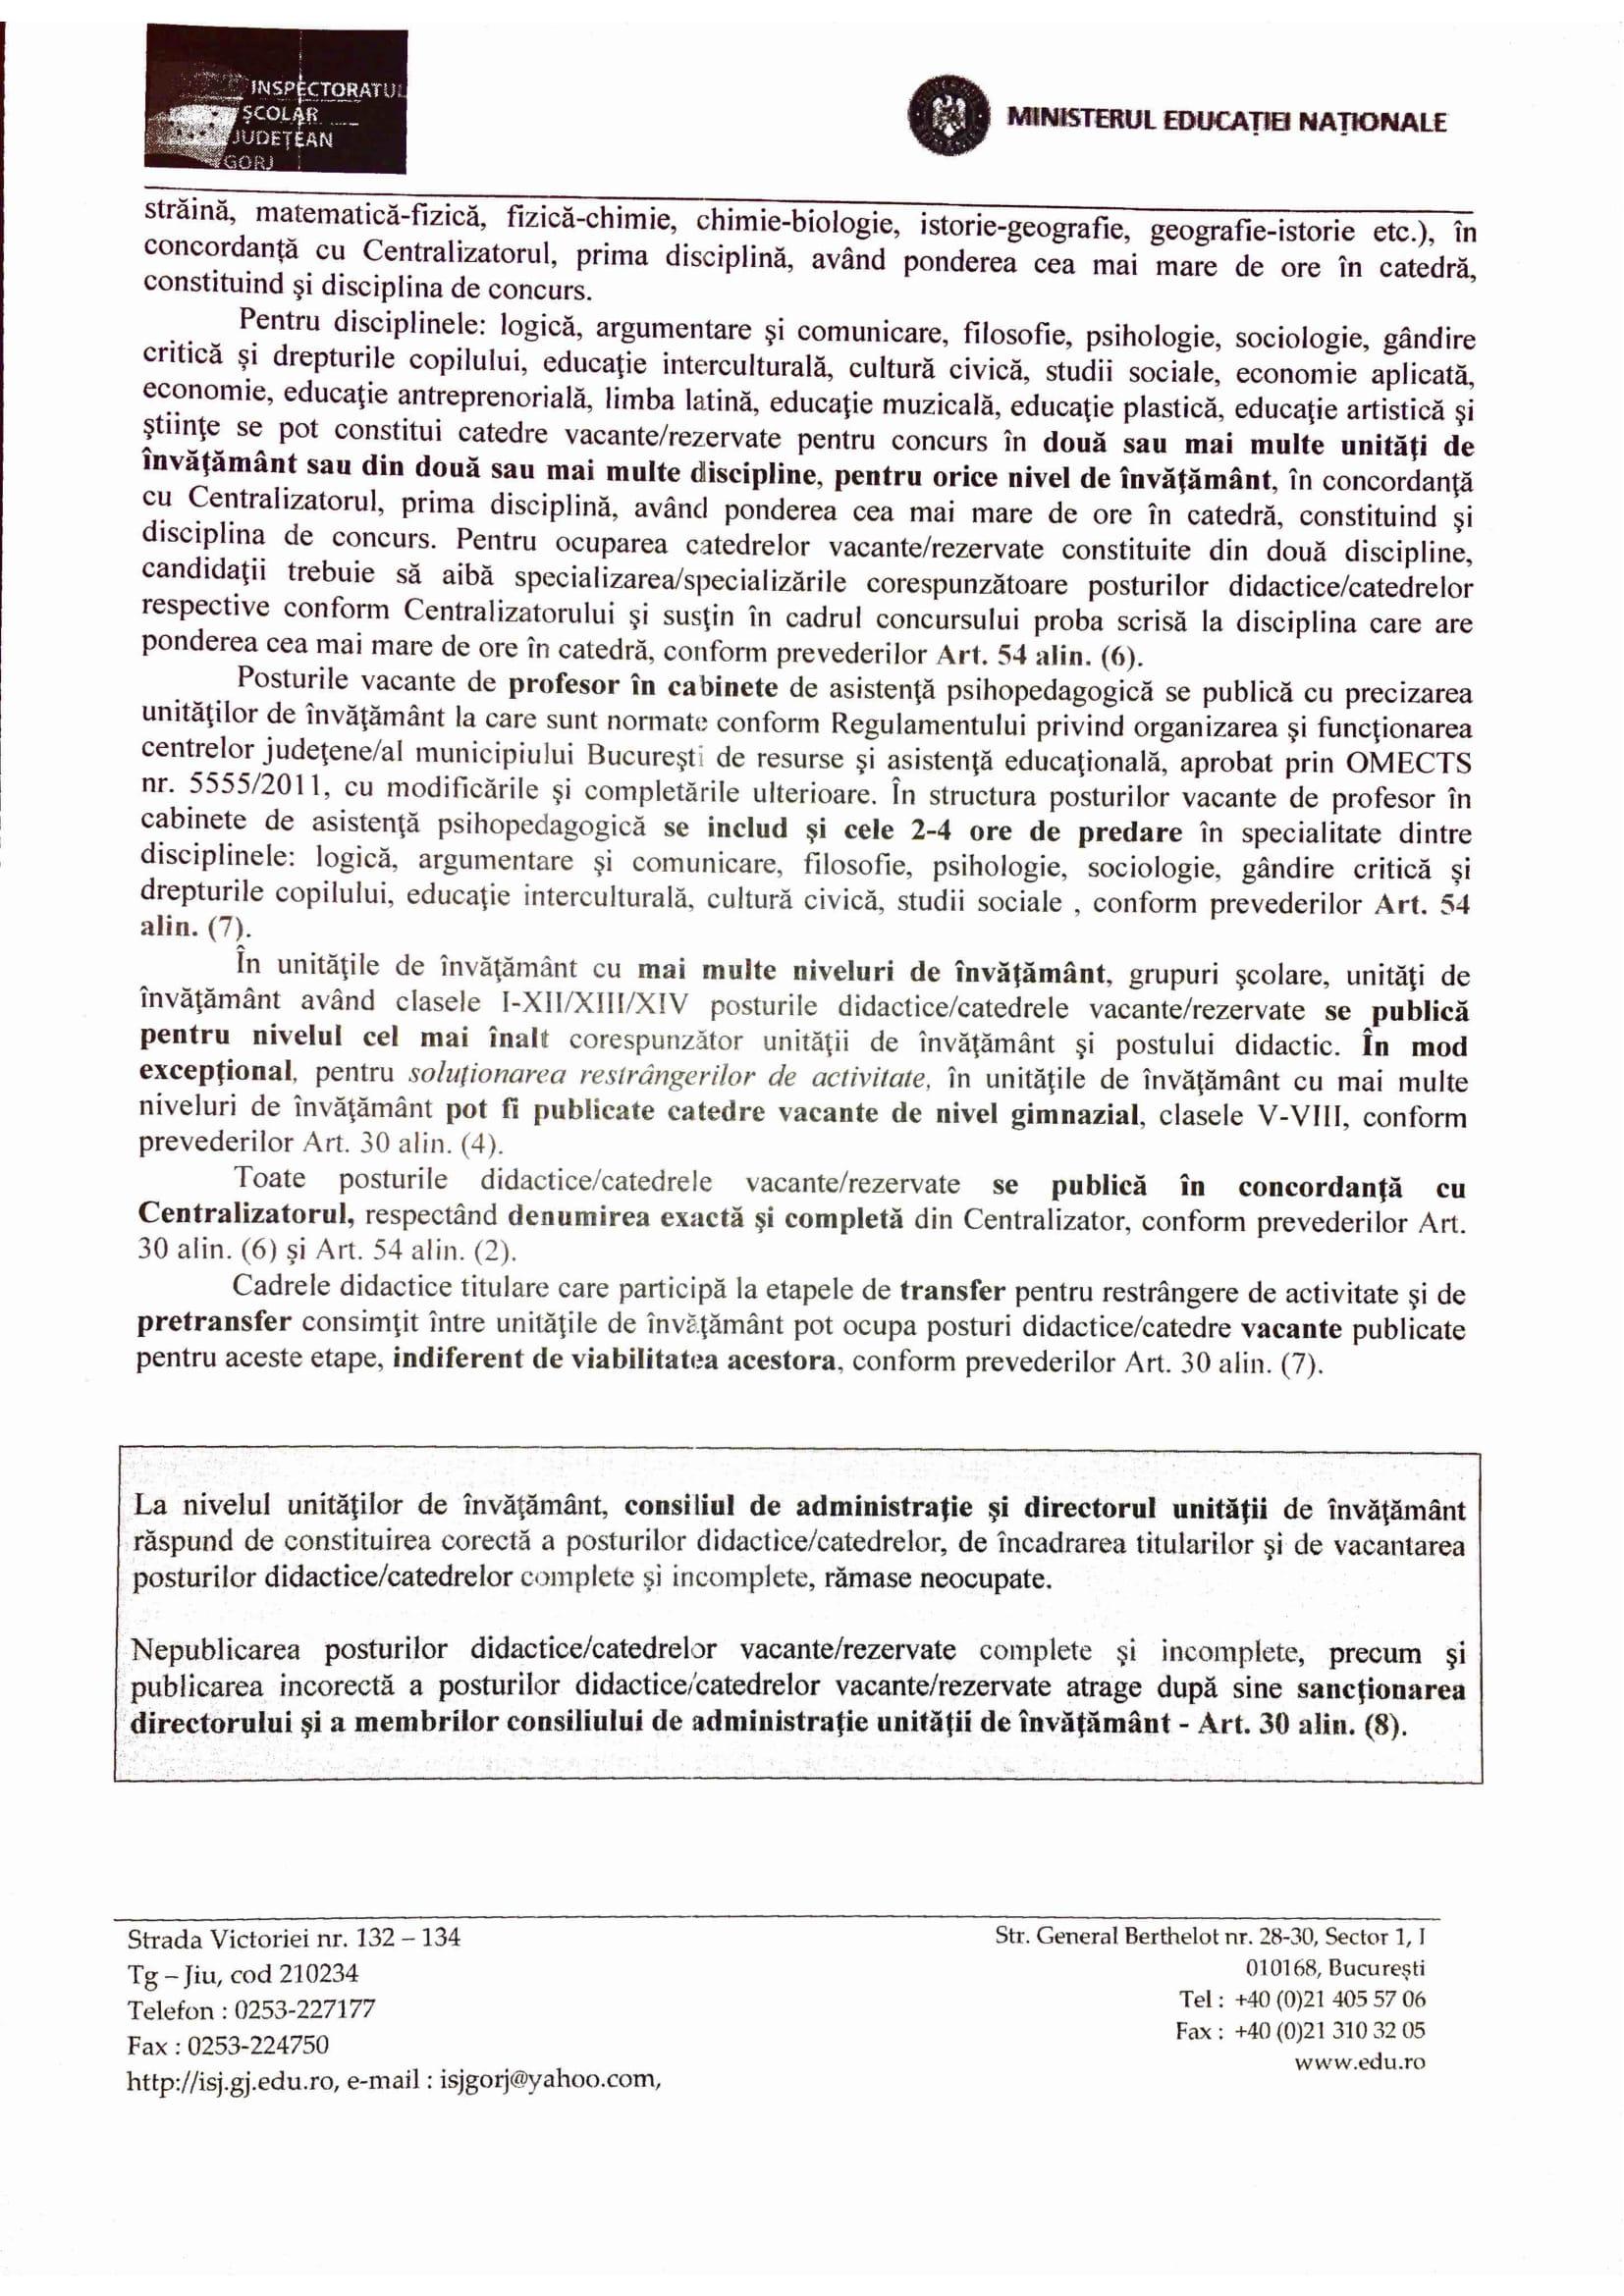 Adresa constituire_încadrare_vacantare-3